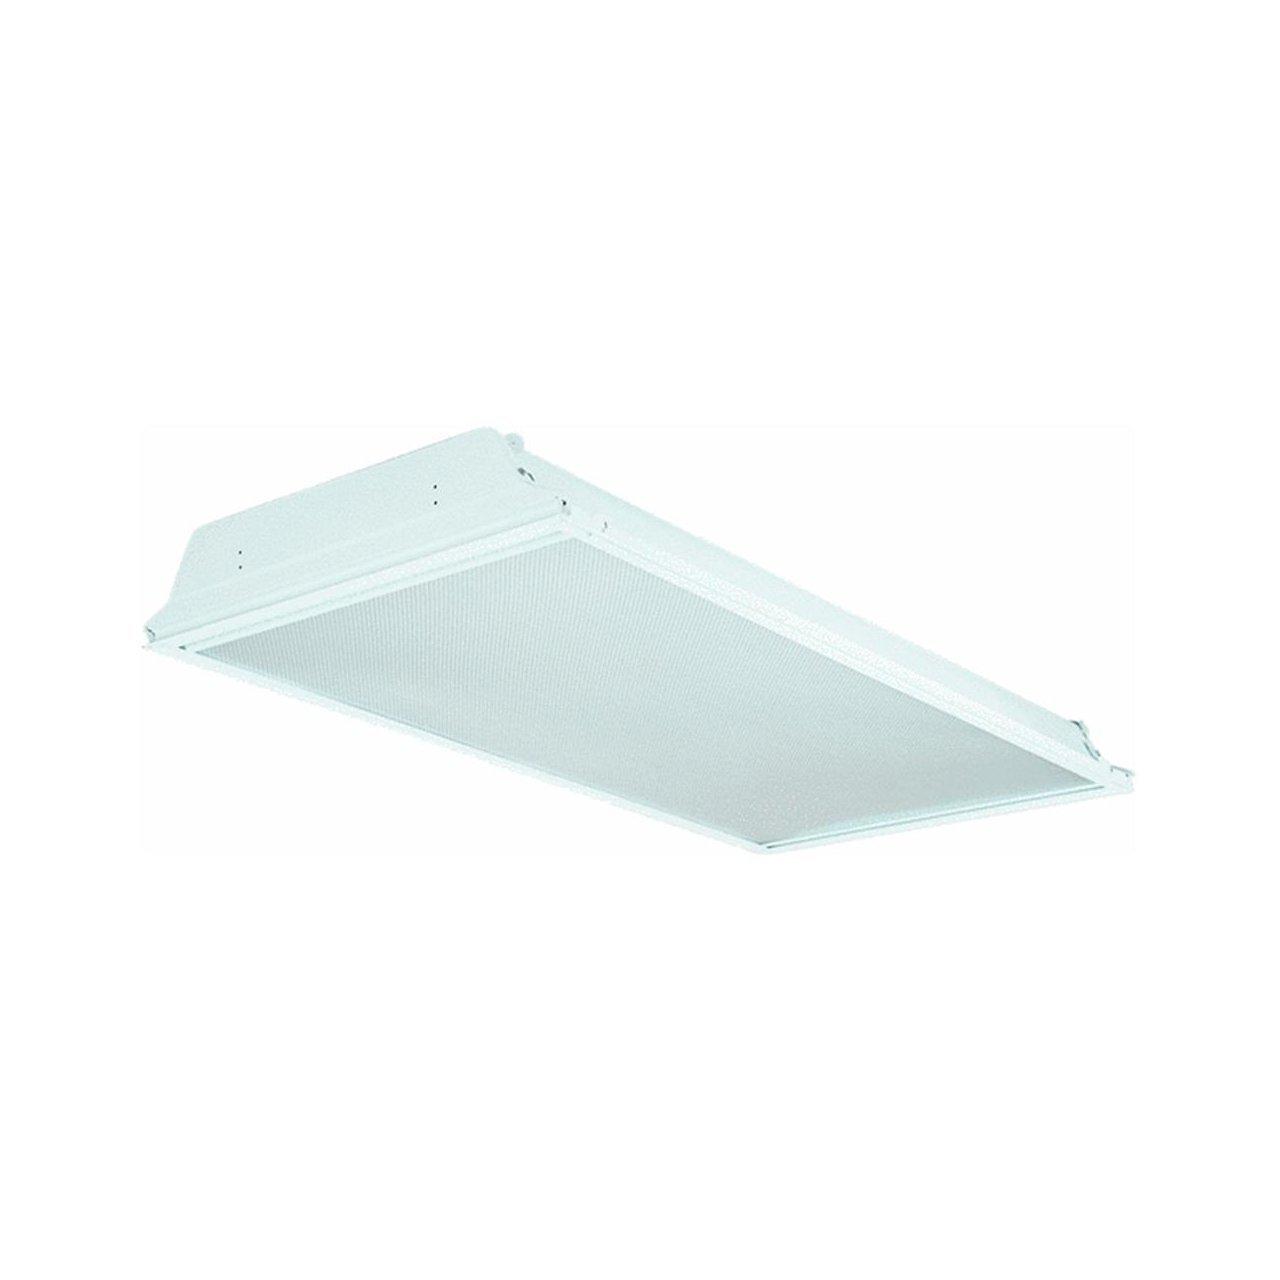 Lithonia Lighting 2Sp8G2U316A12120Gesb 2-Light Troffer Grid Light